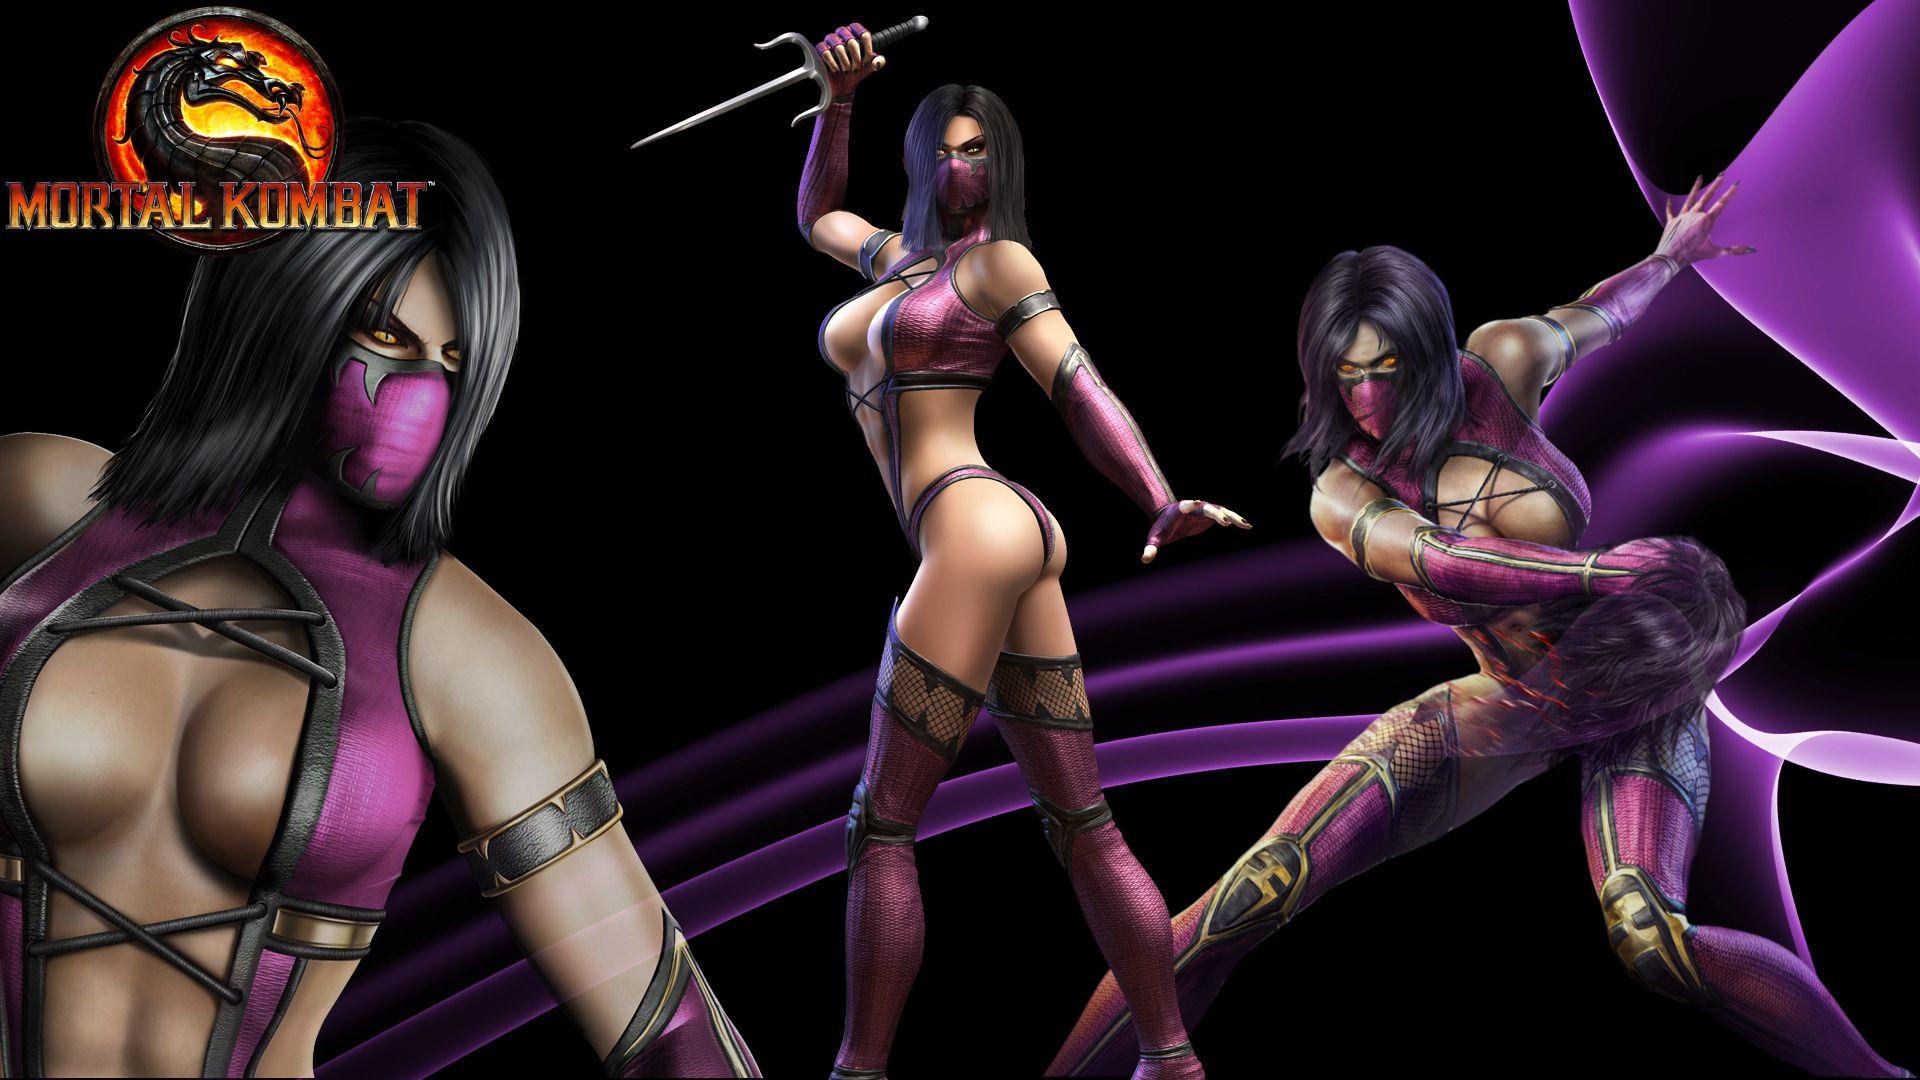 Mortal Kombat 9 Females - Google Search  Mileena-1988